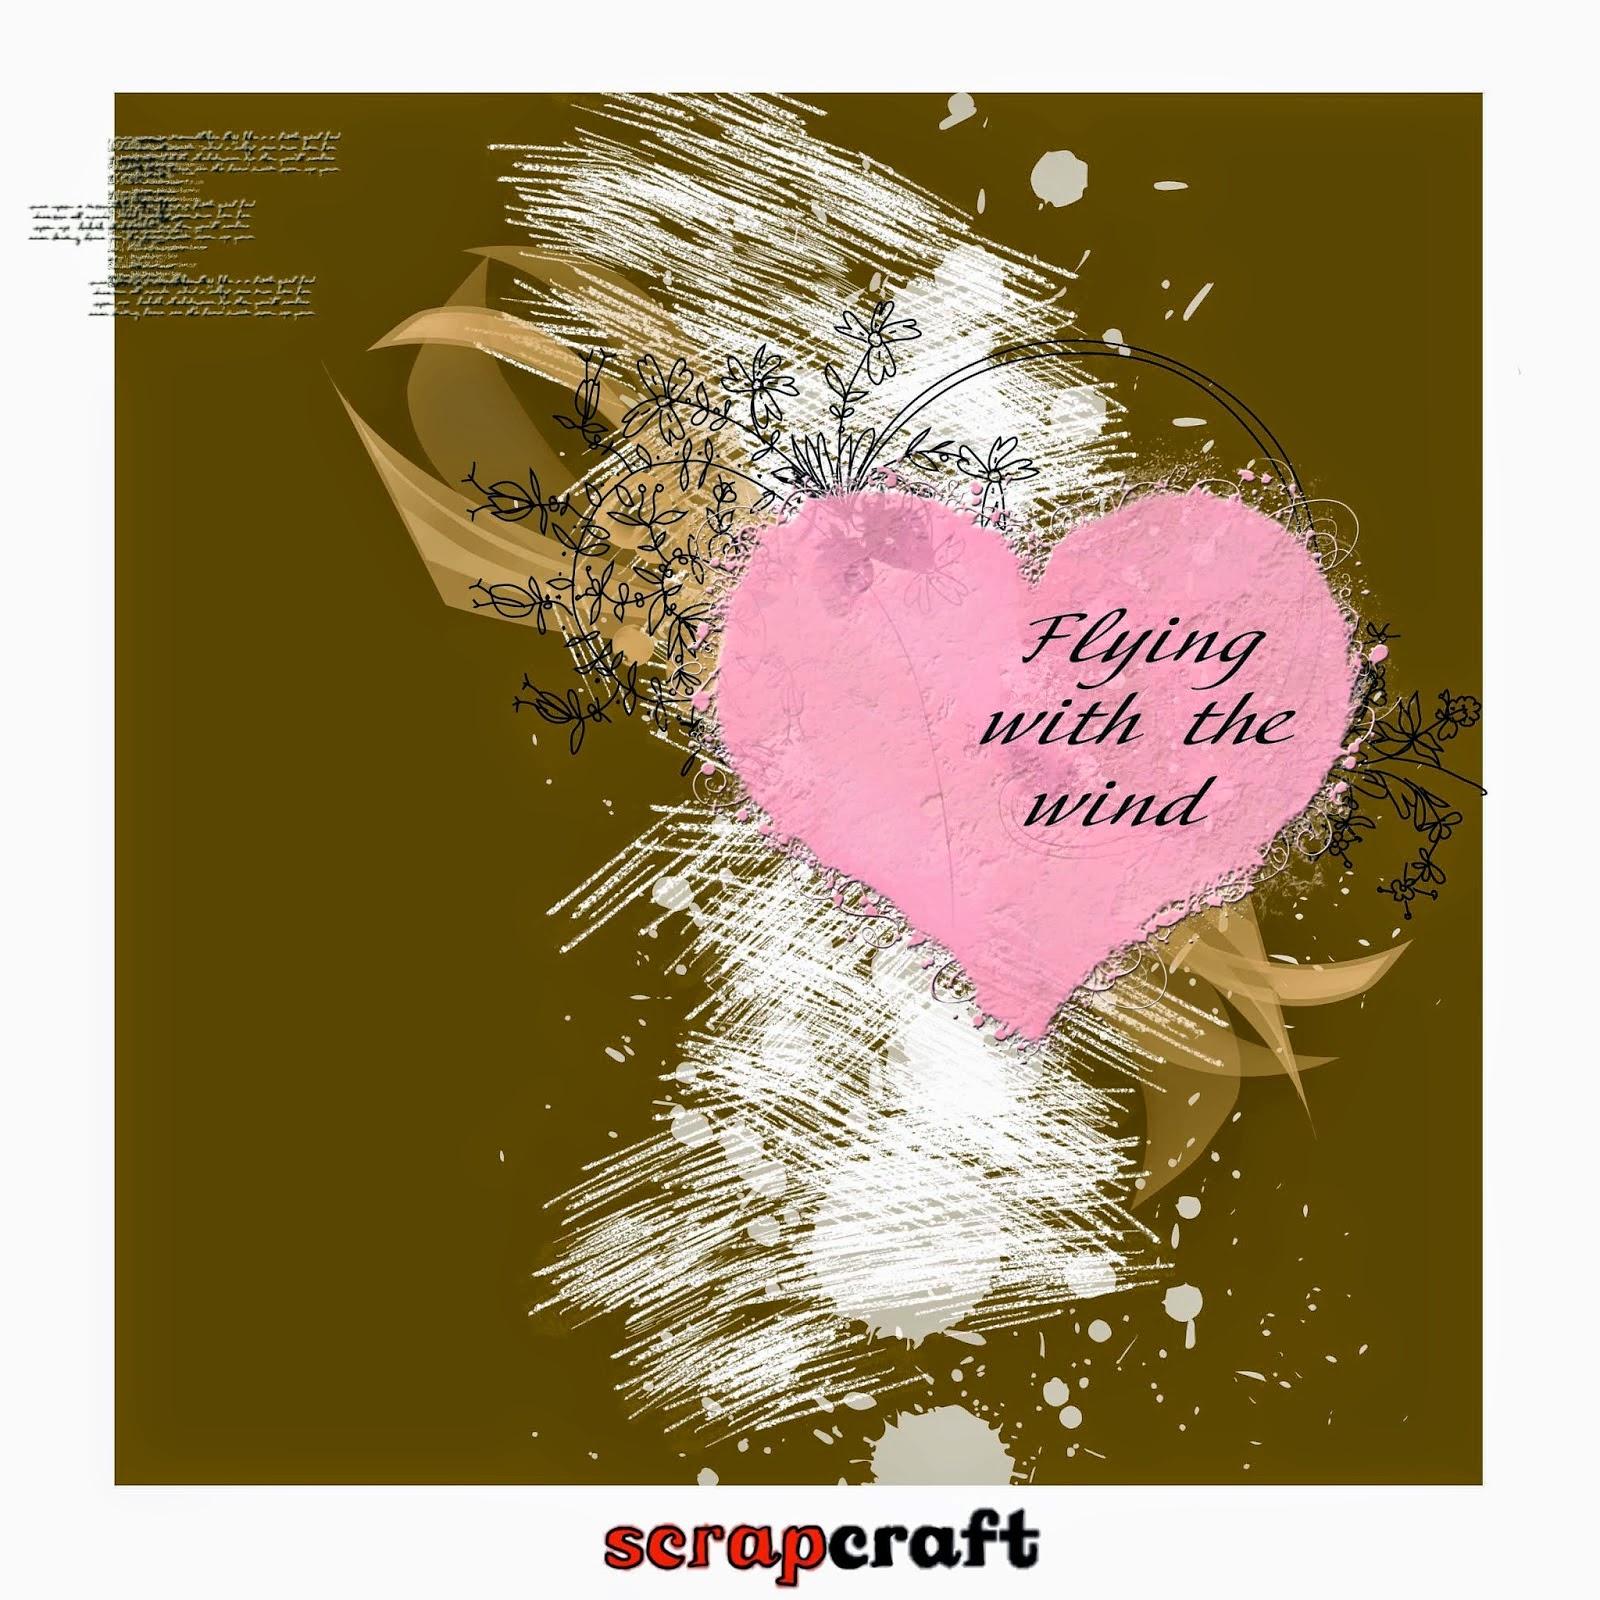 http://scrapcraft-ru.blogspot.com/2014/05/3-31.html